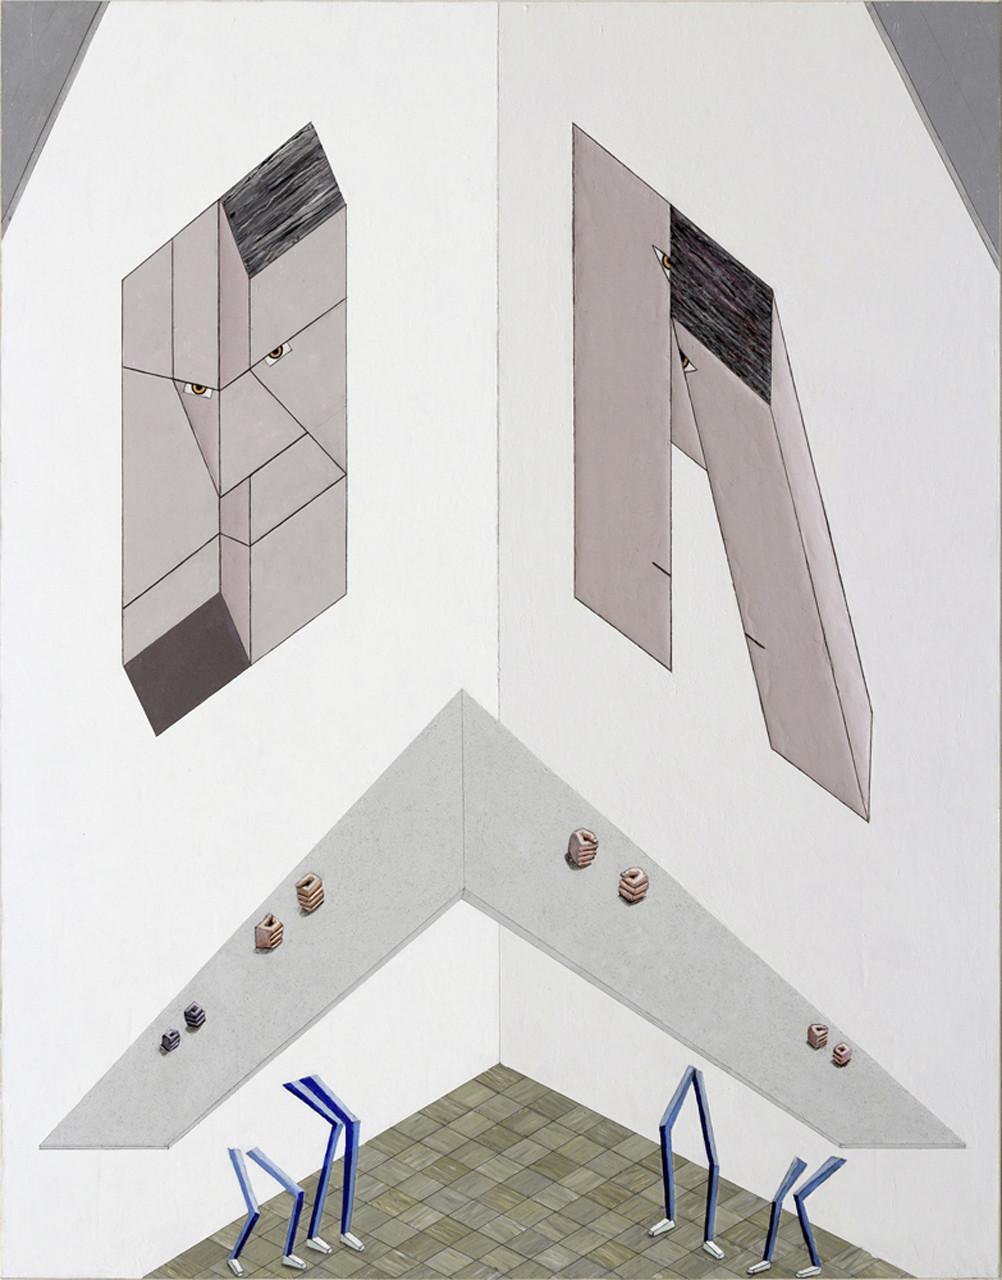 "<div class=""artwork_caption""><p>Mernet Larsen, Fisticuffs, 2015</p></div>"